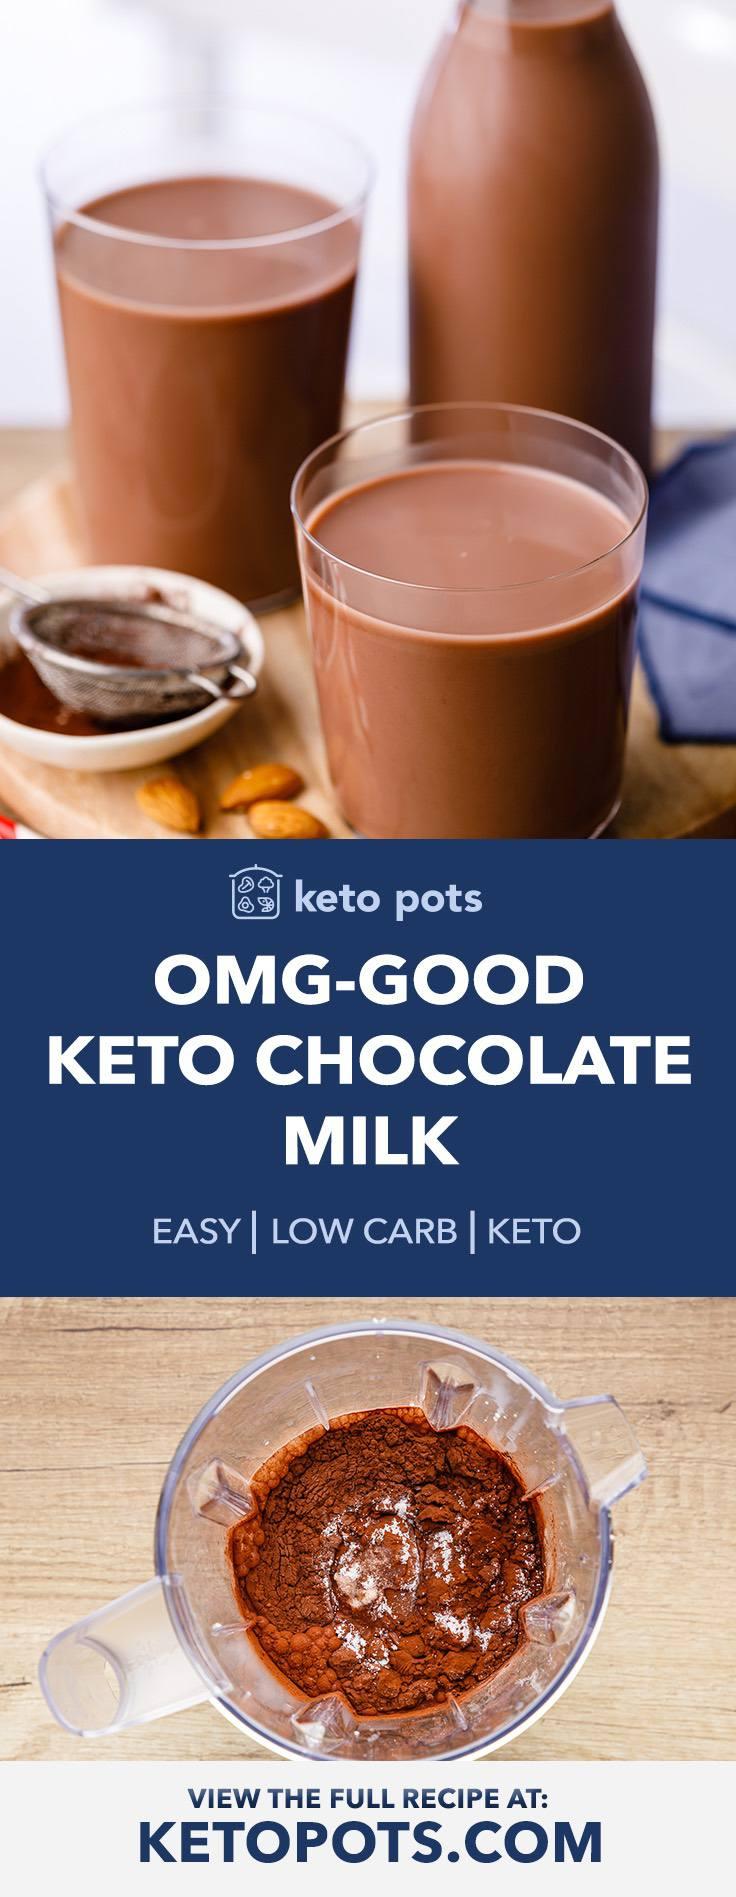 OMG-Good Homemade Keto Chocolate Milk